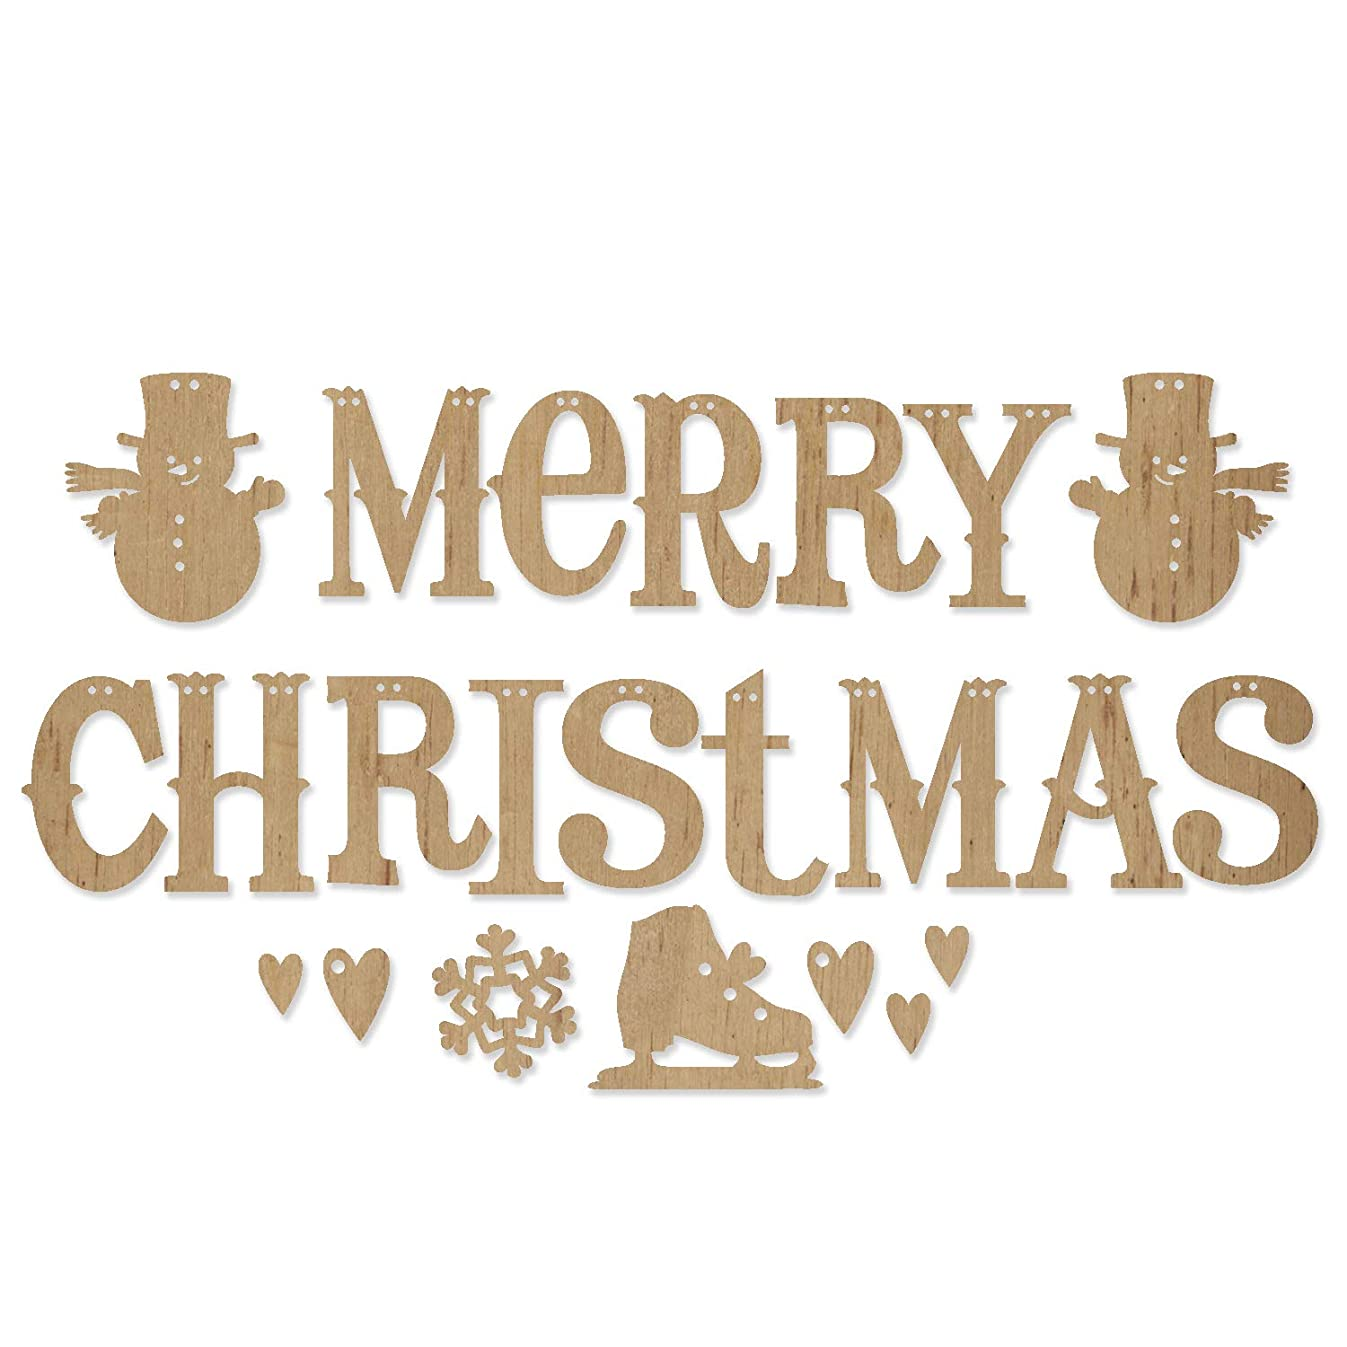 ADORNit DIY Wood Swag Banner Hanger - Merry Christmas